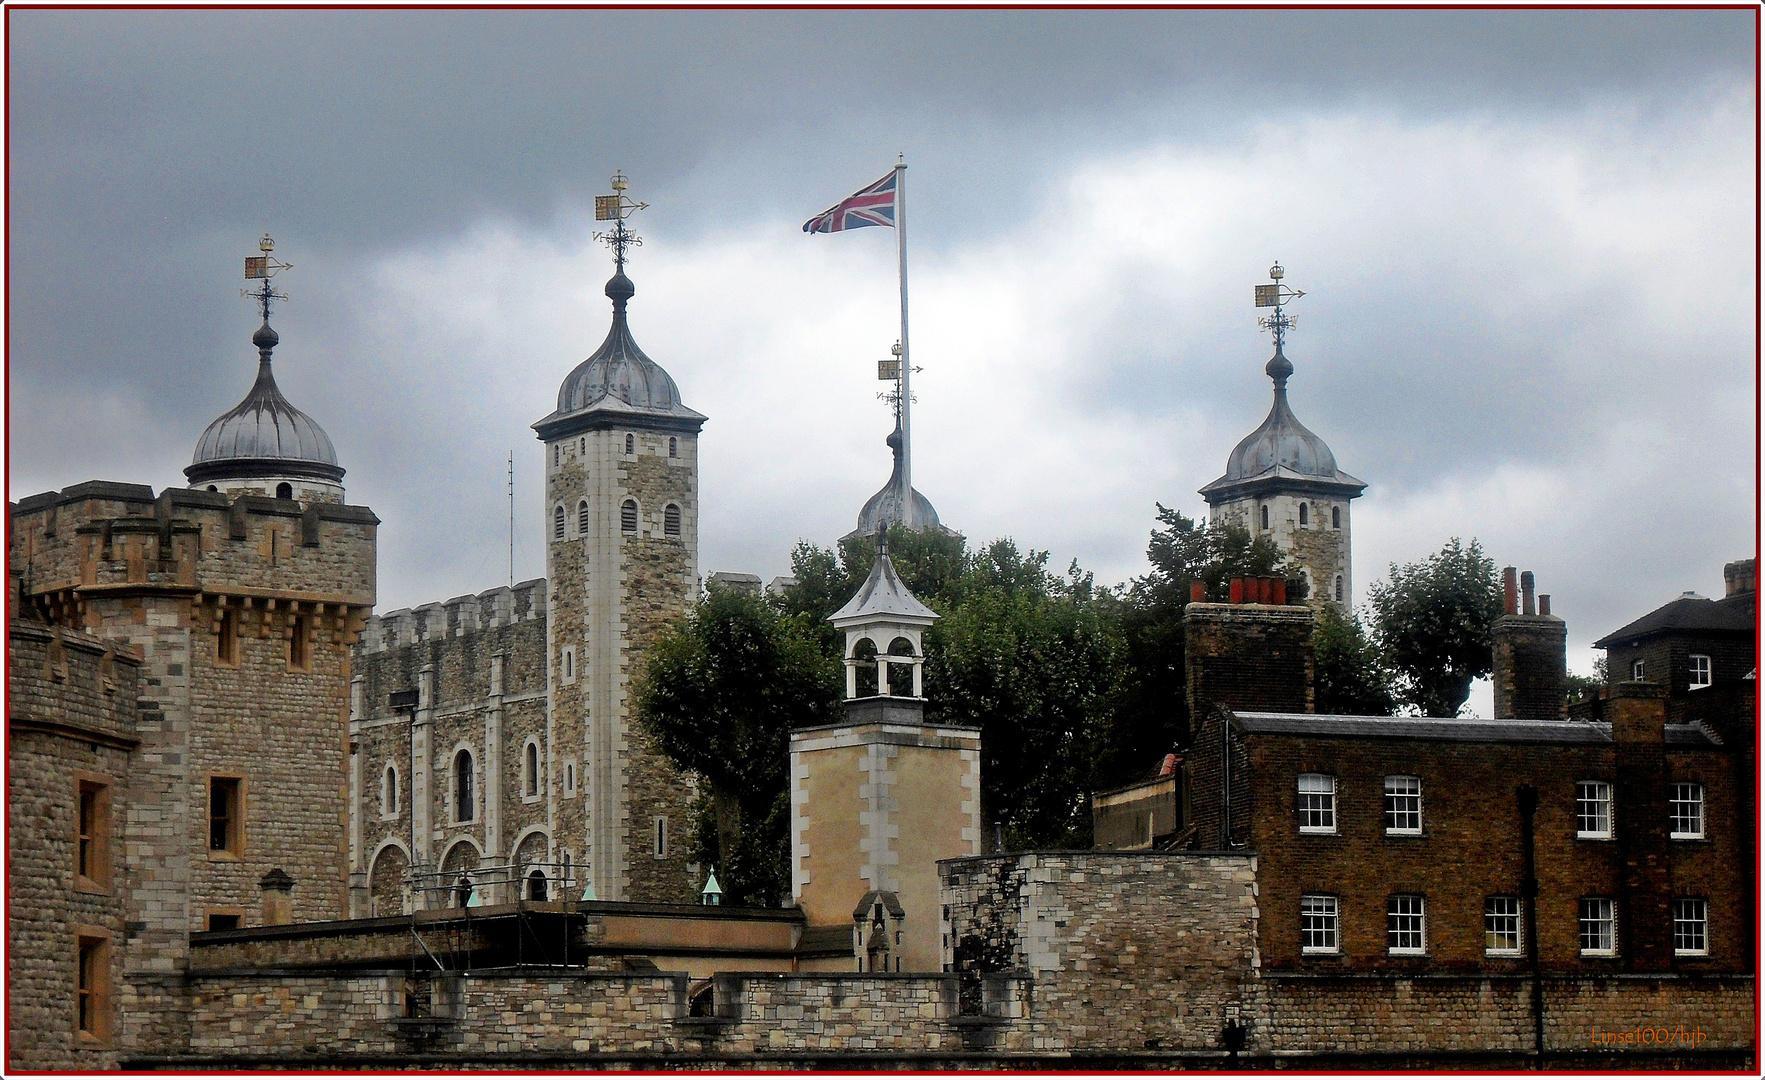 London - Tower